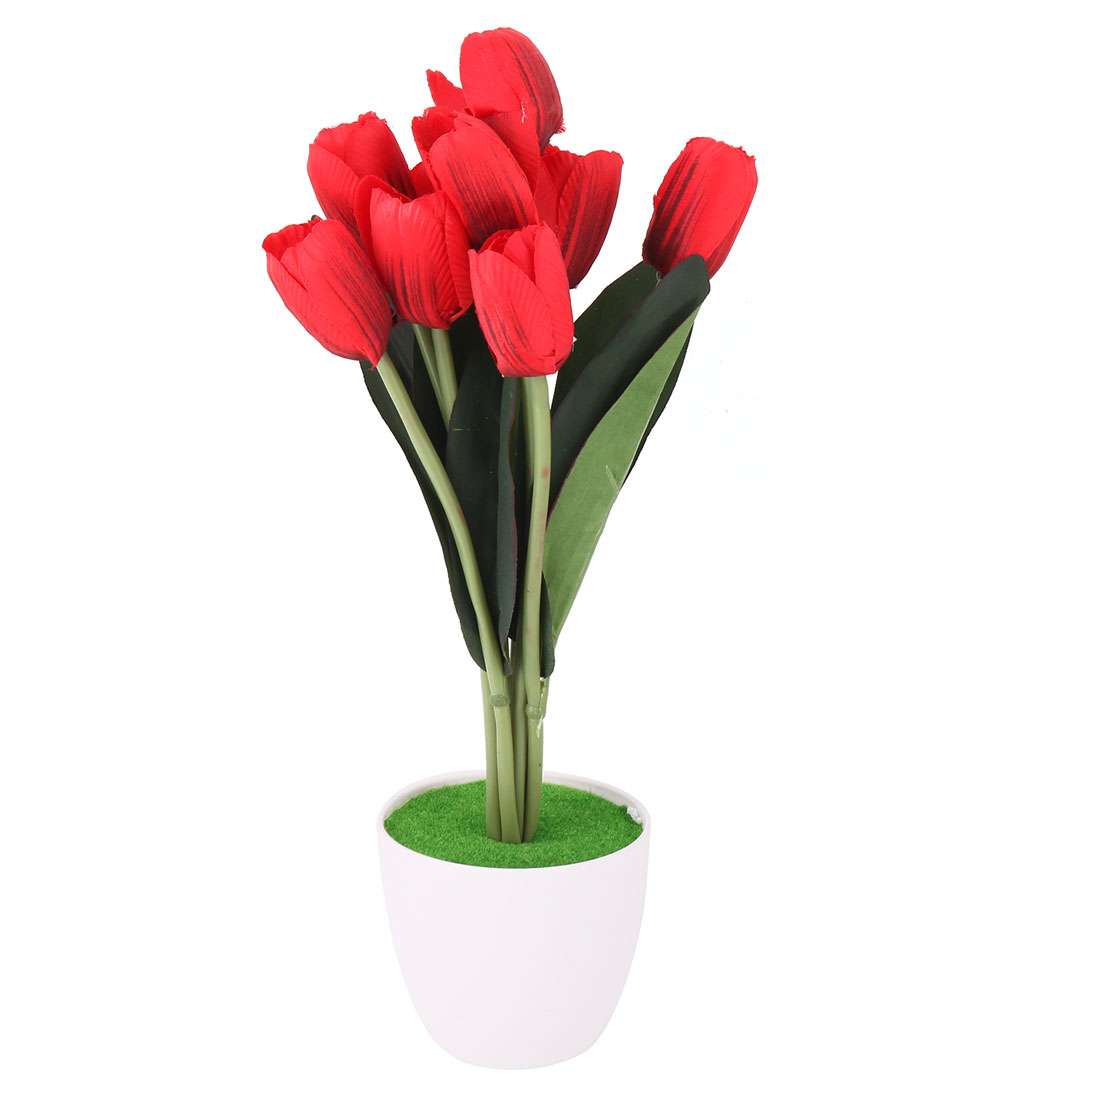 Restaurant Indoor DIY Handcraft Decor Artificial Simulation Tulips Flower Red